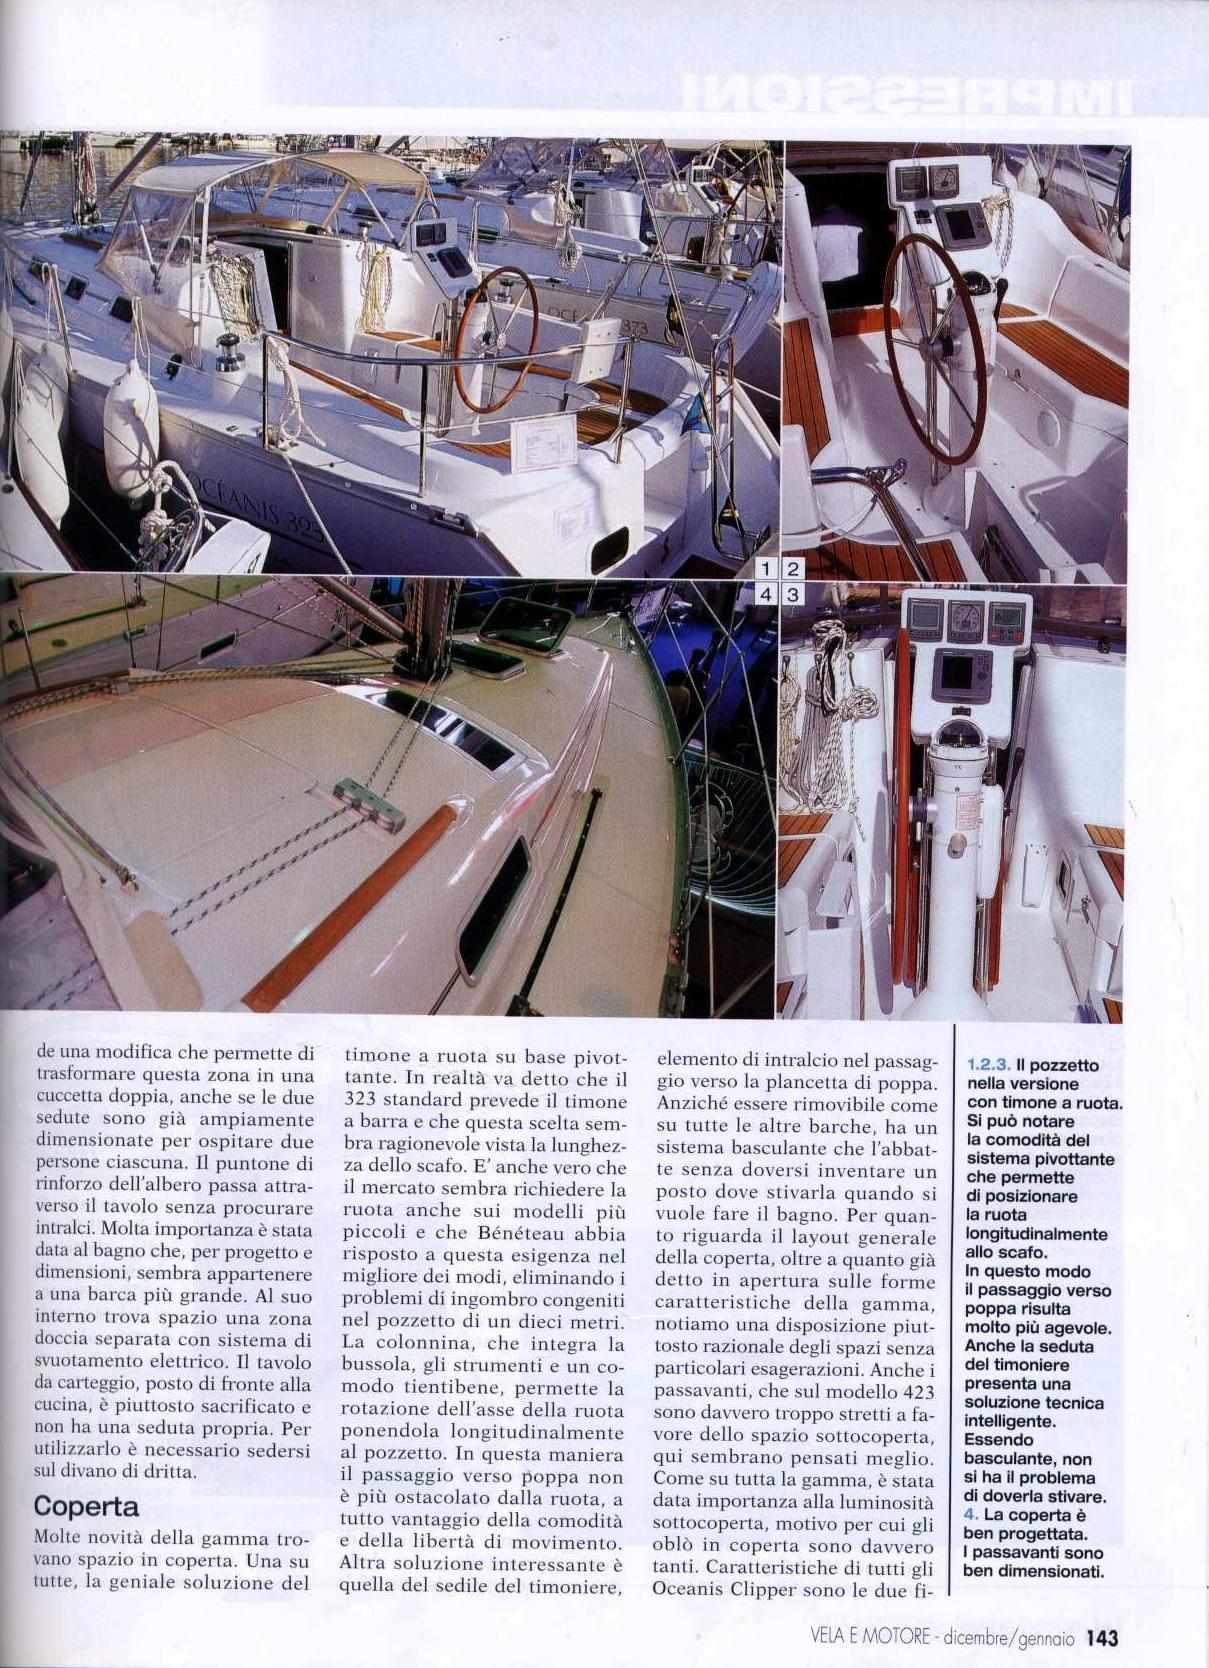 oceanis-323-vela-e-motore-gennaio-2004-1